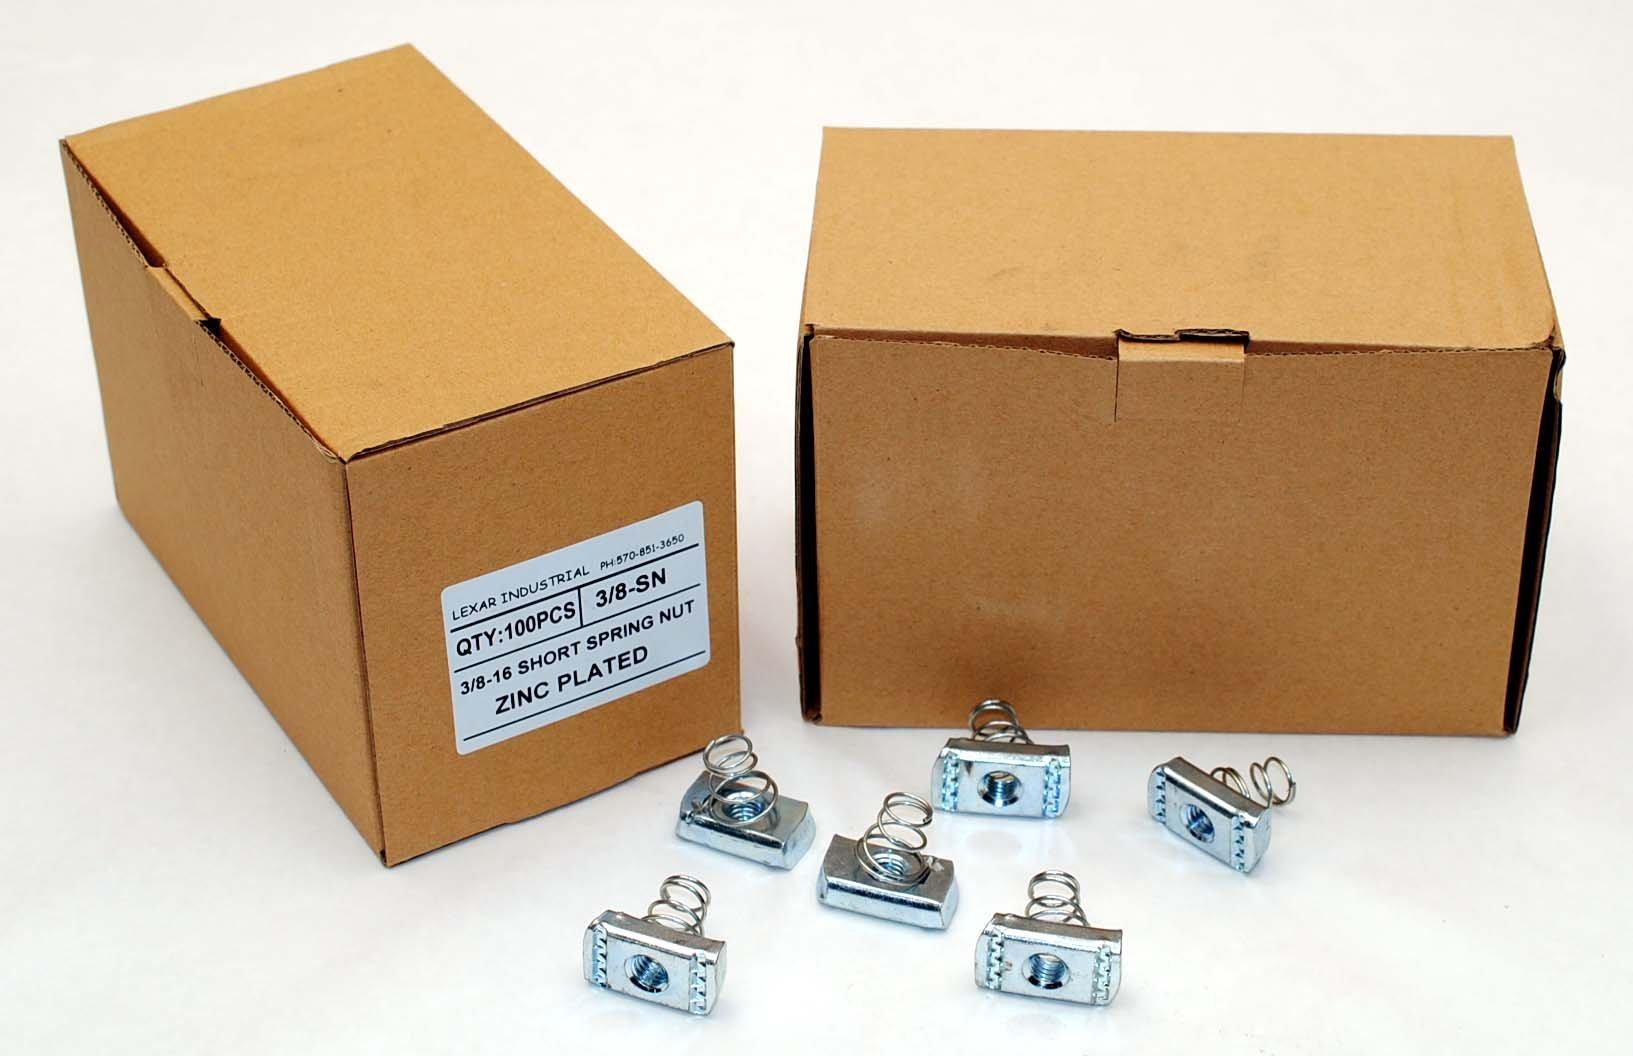 (100) Strut Channel Nuts 3/8-16 Short Spring Zinc Plated Unistrut Nut by Lexar Industrial